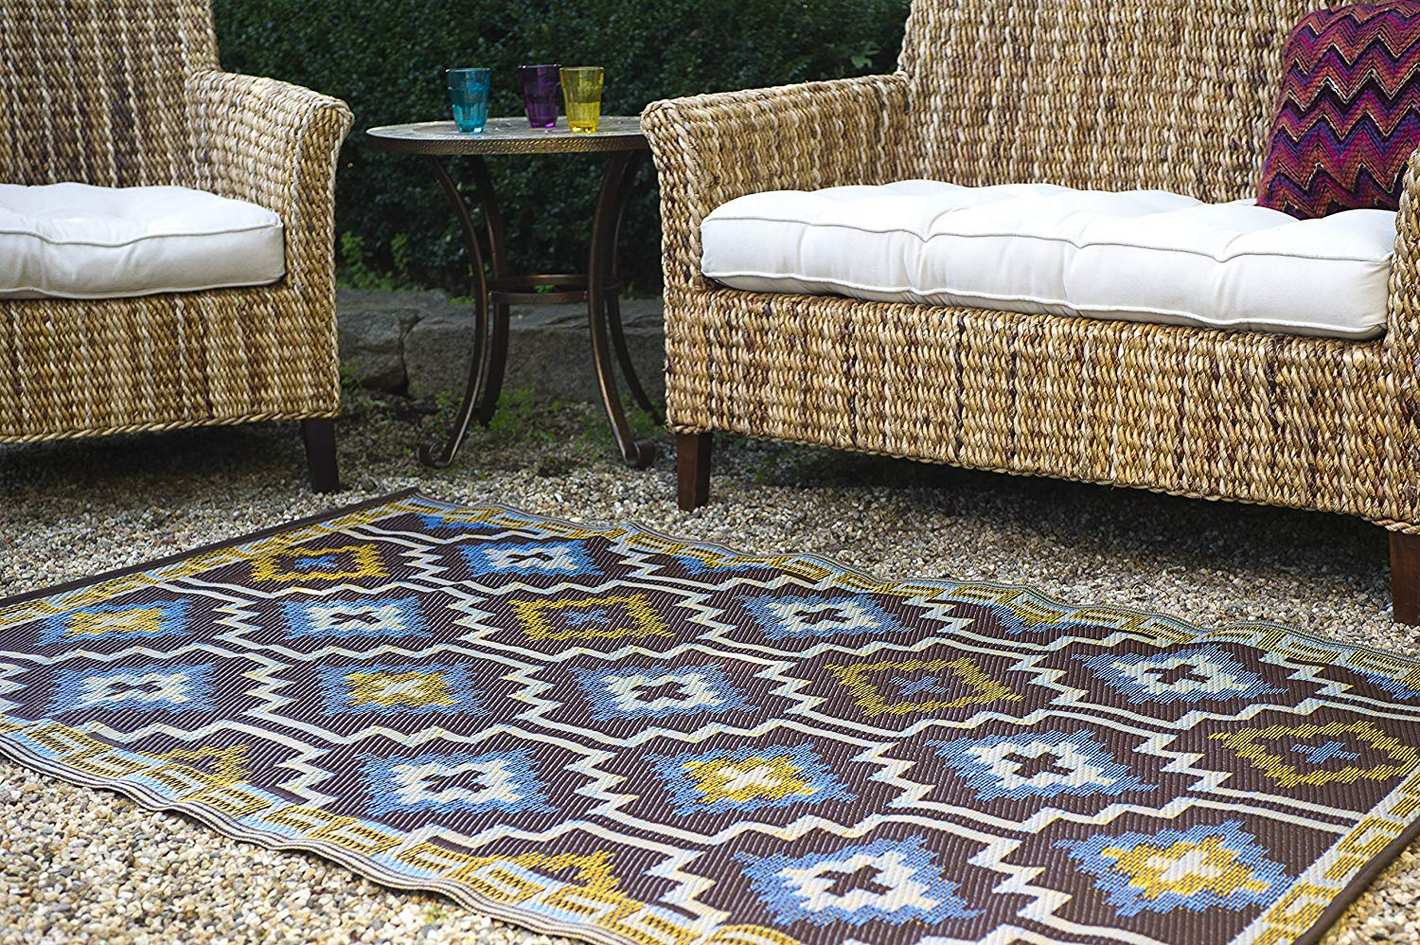 Fab Habitat Reversible, Indoor/Outdoor Floor Mat/Rug (5' x 8', Lhasa - Royal Blue & Chocolate Brown)